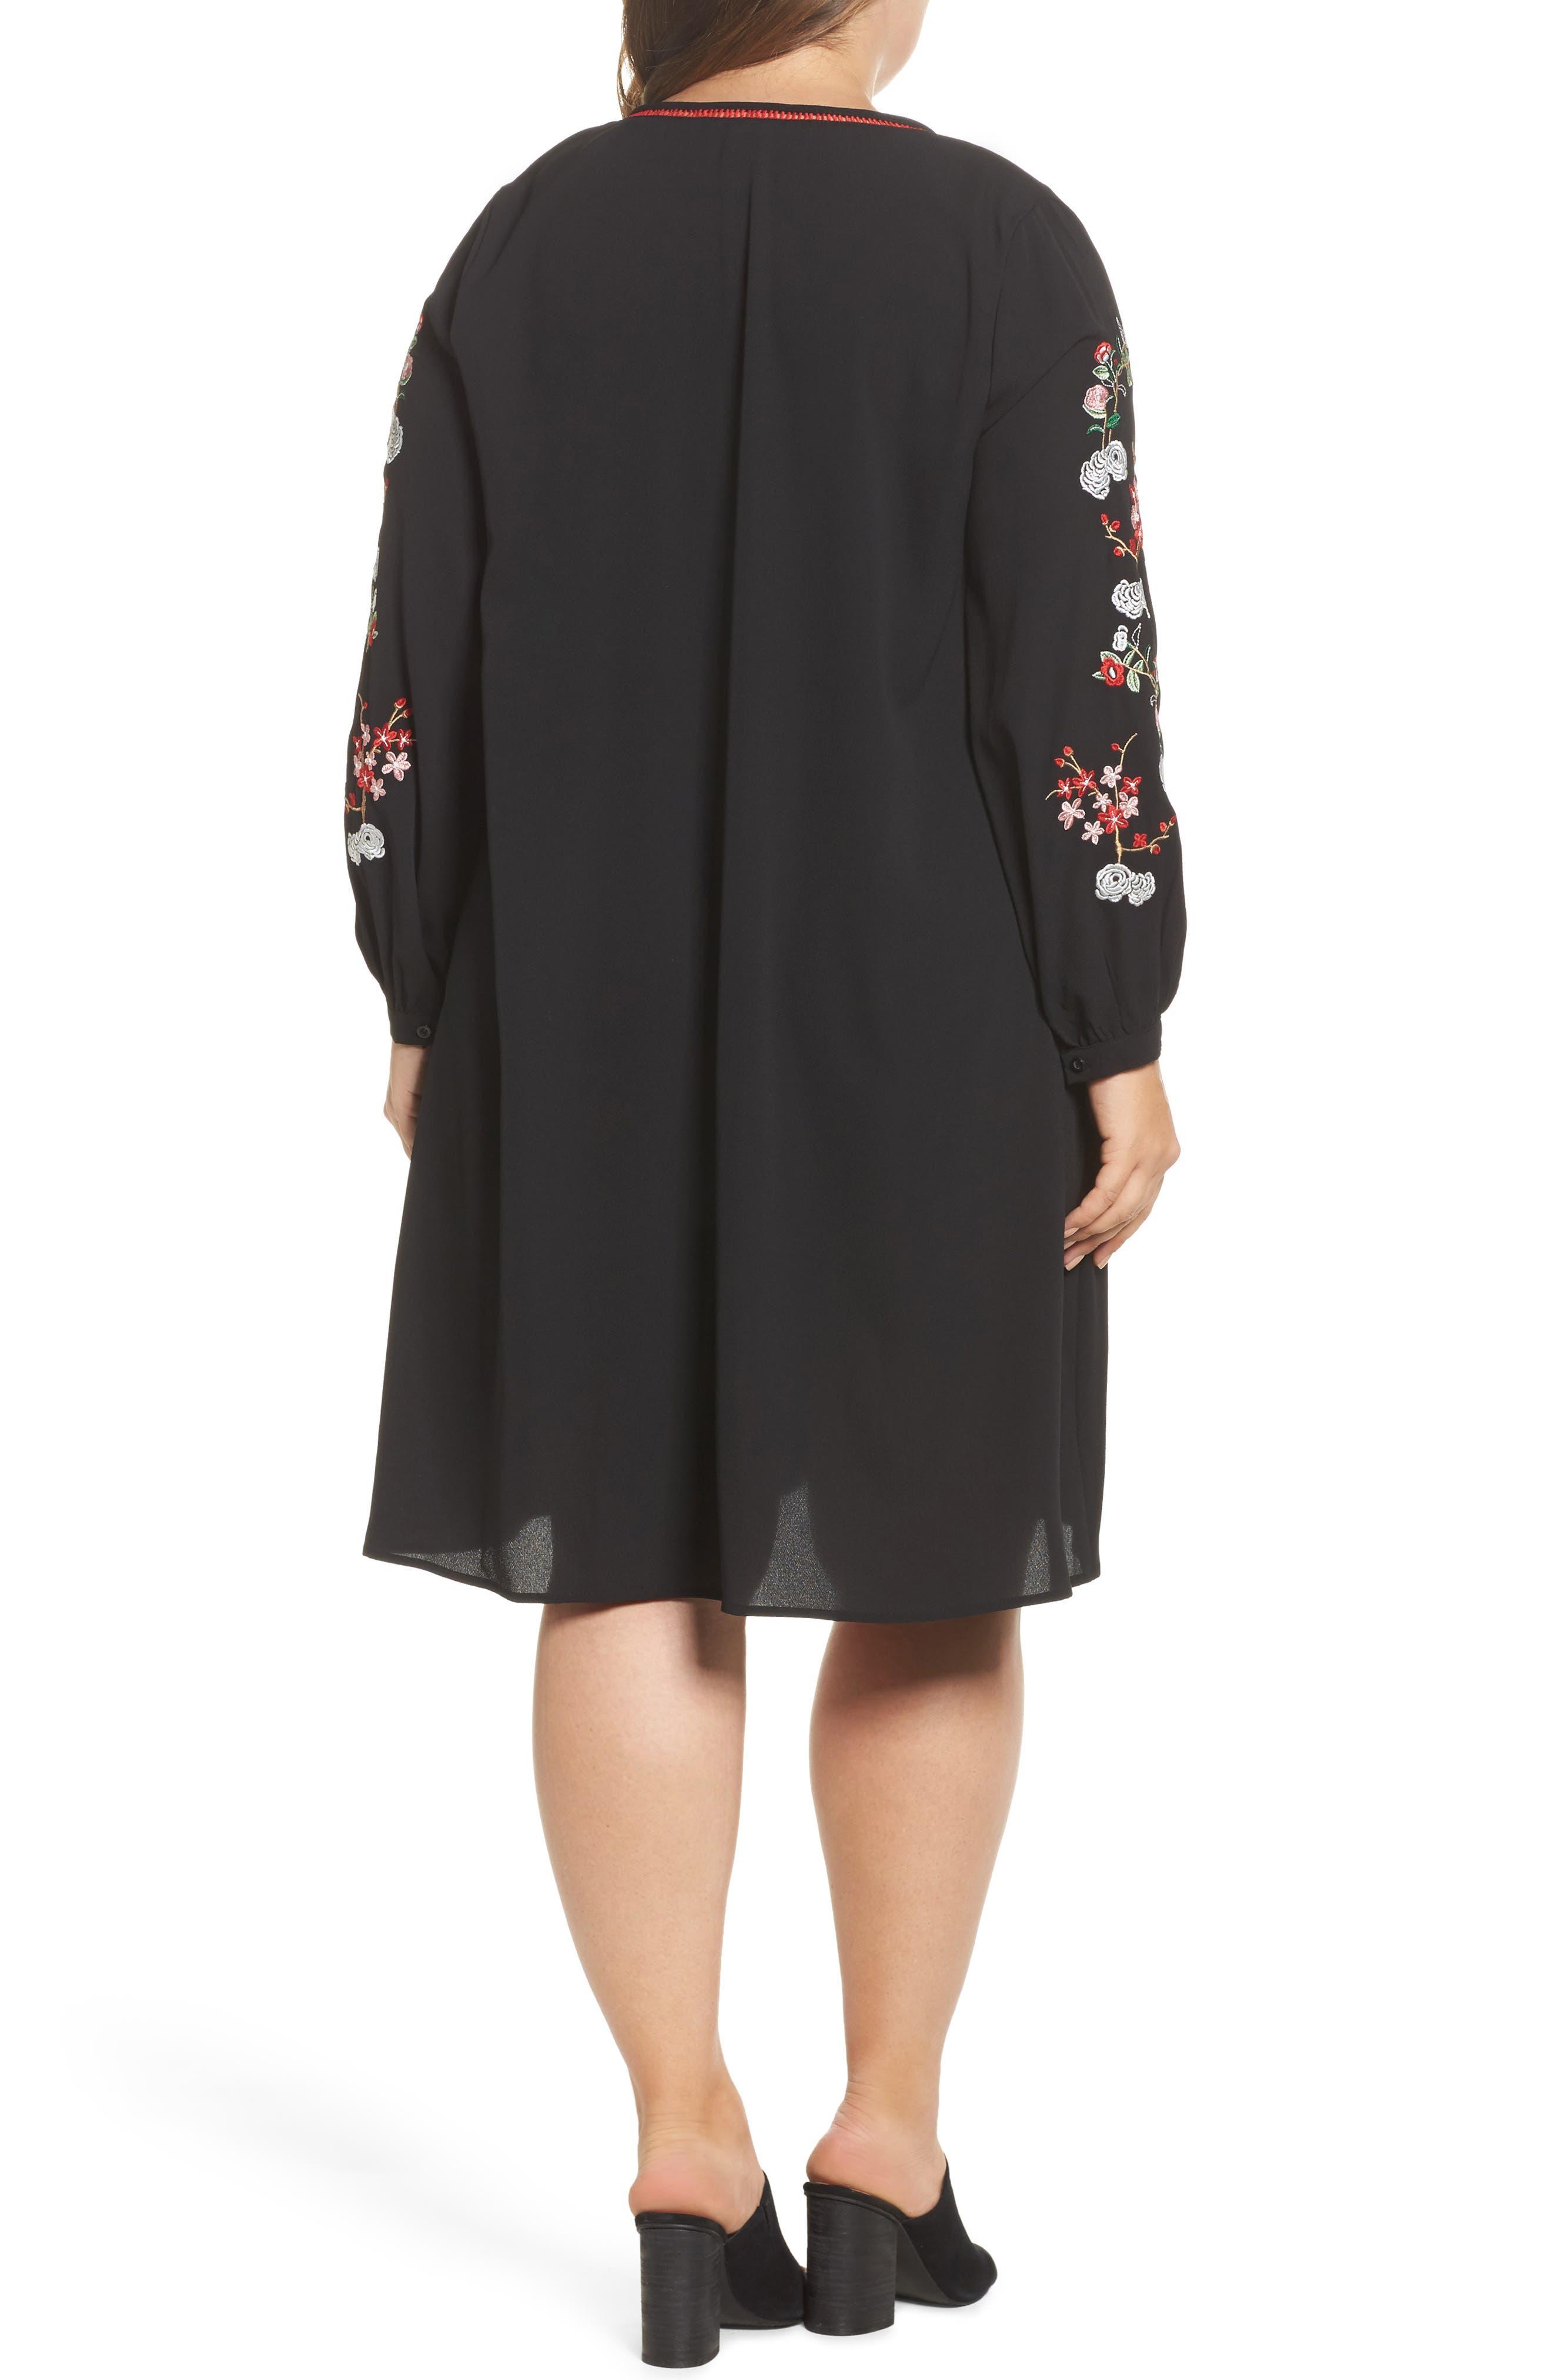 Floral Embroidered Shift Dress,                             Alternate thumbnail 2, color,                             Black